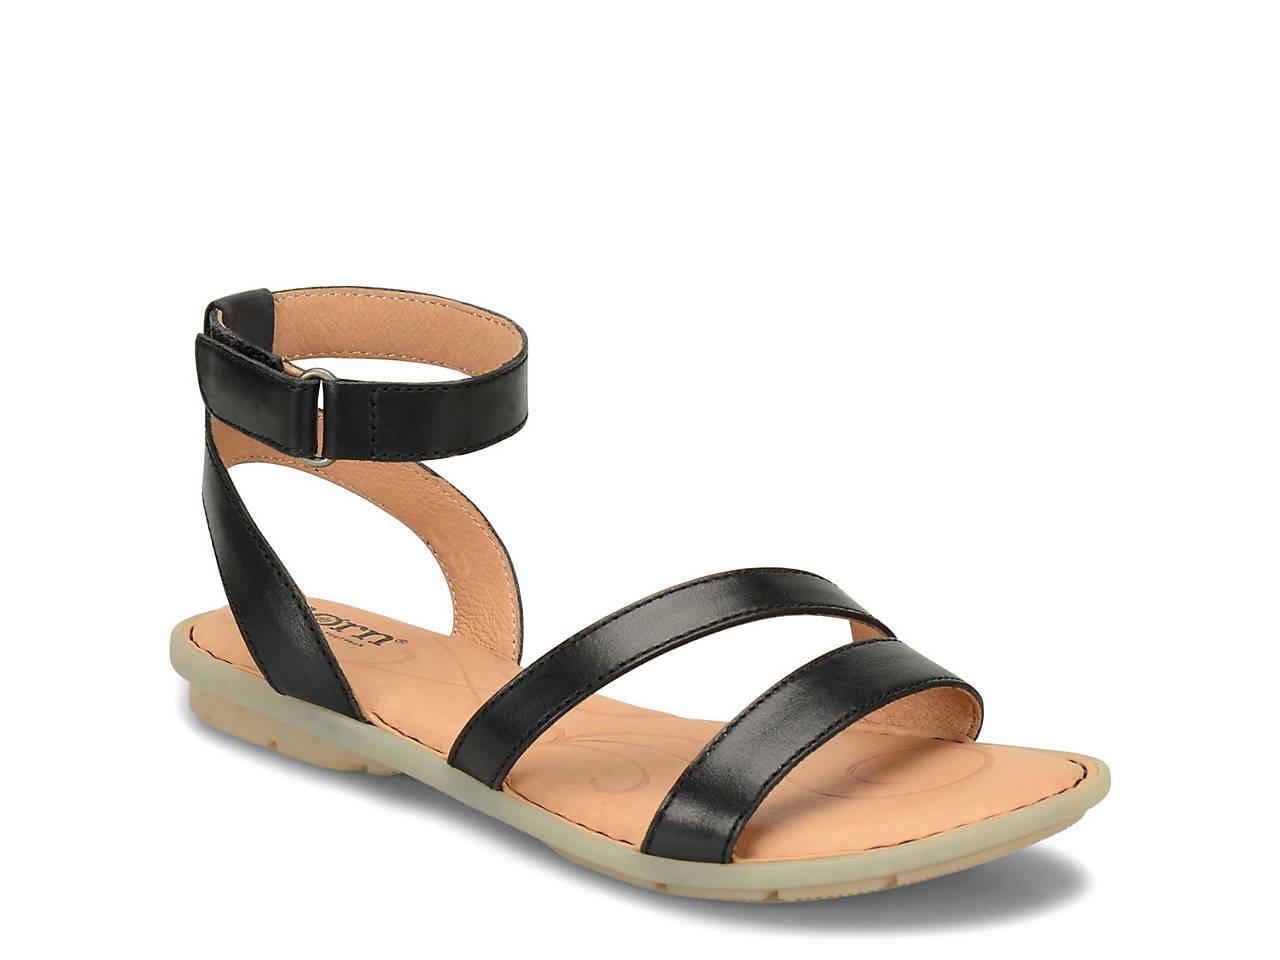 7b75e7654311 Born August Flat Sandal Women s Shoes